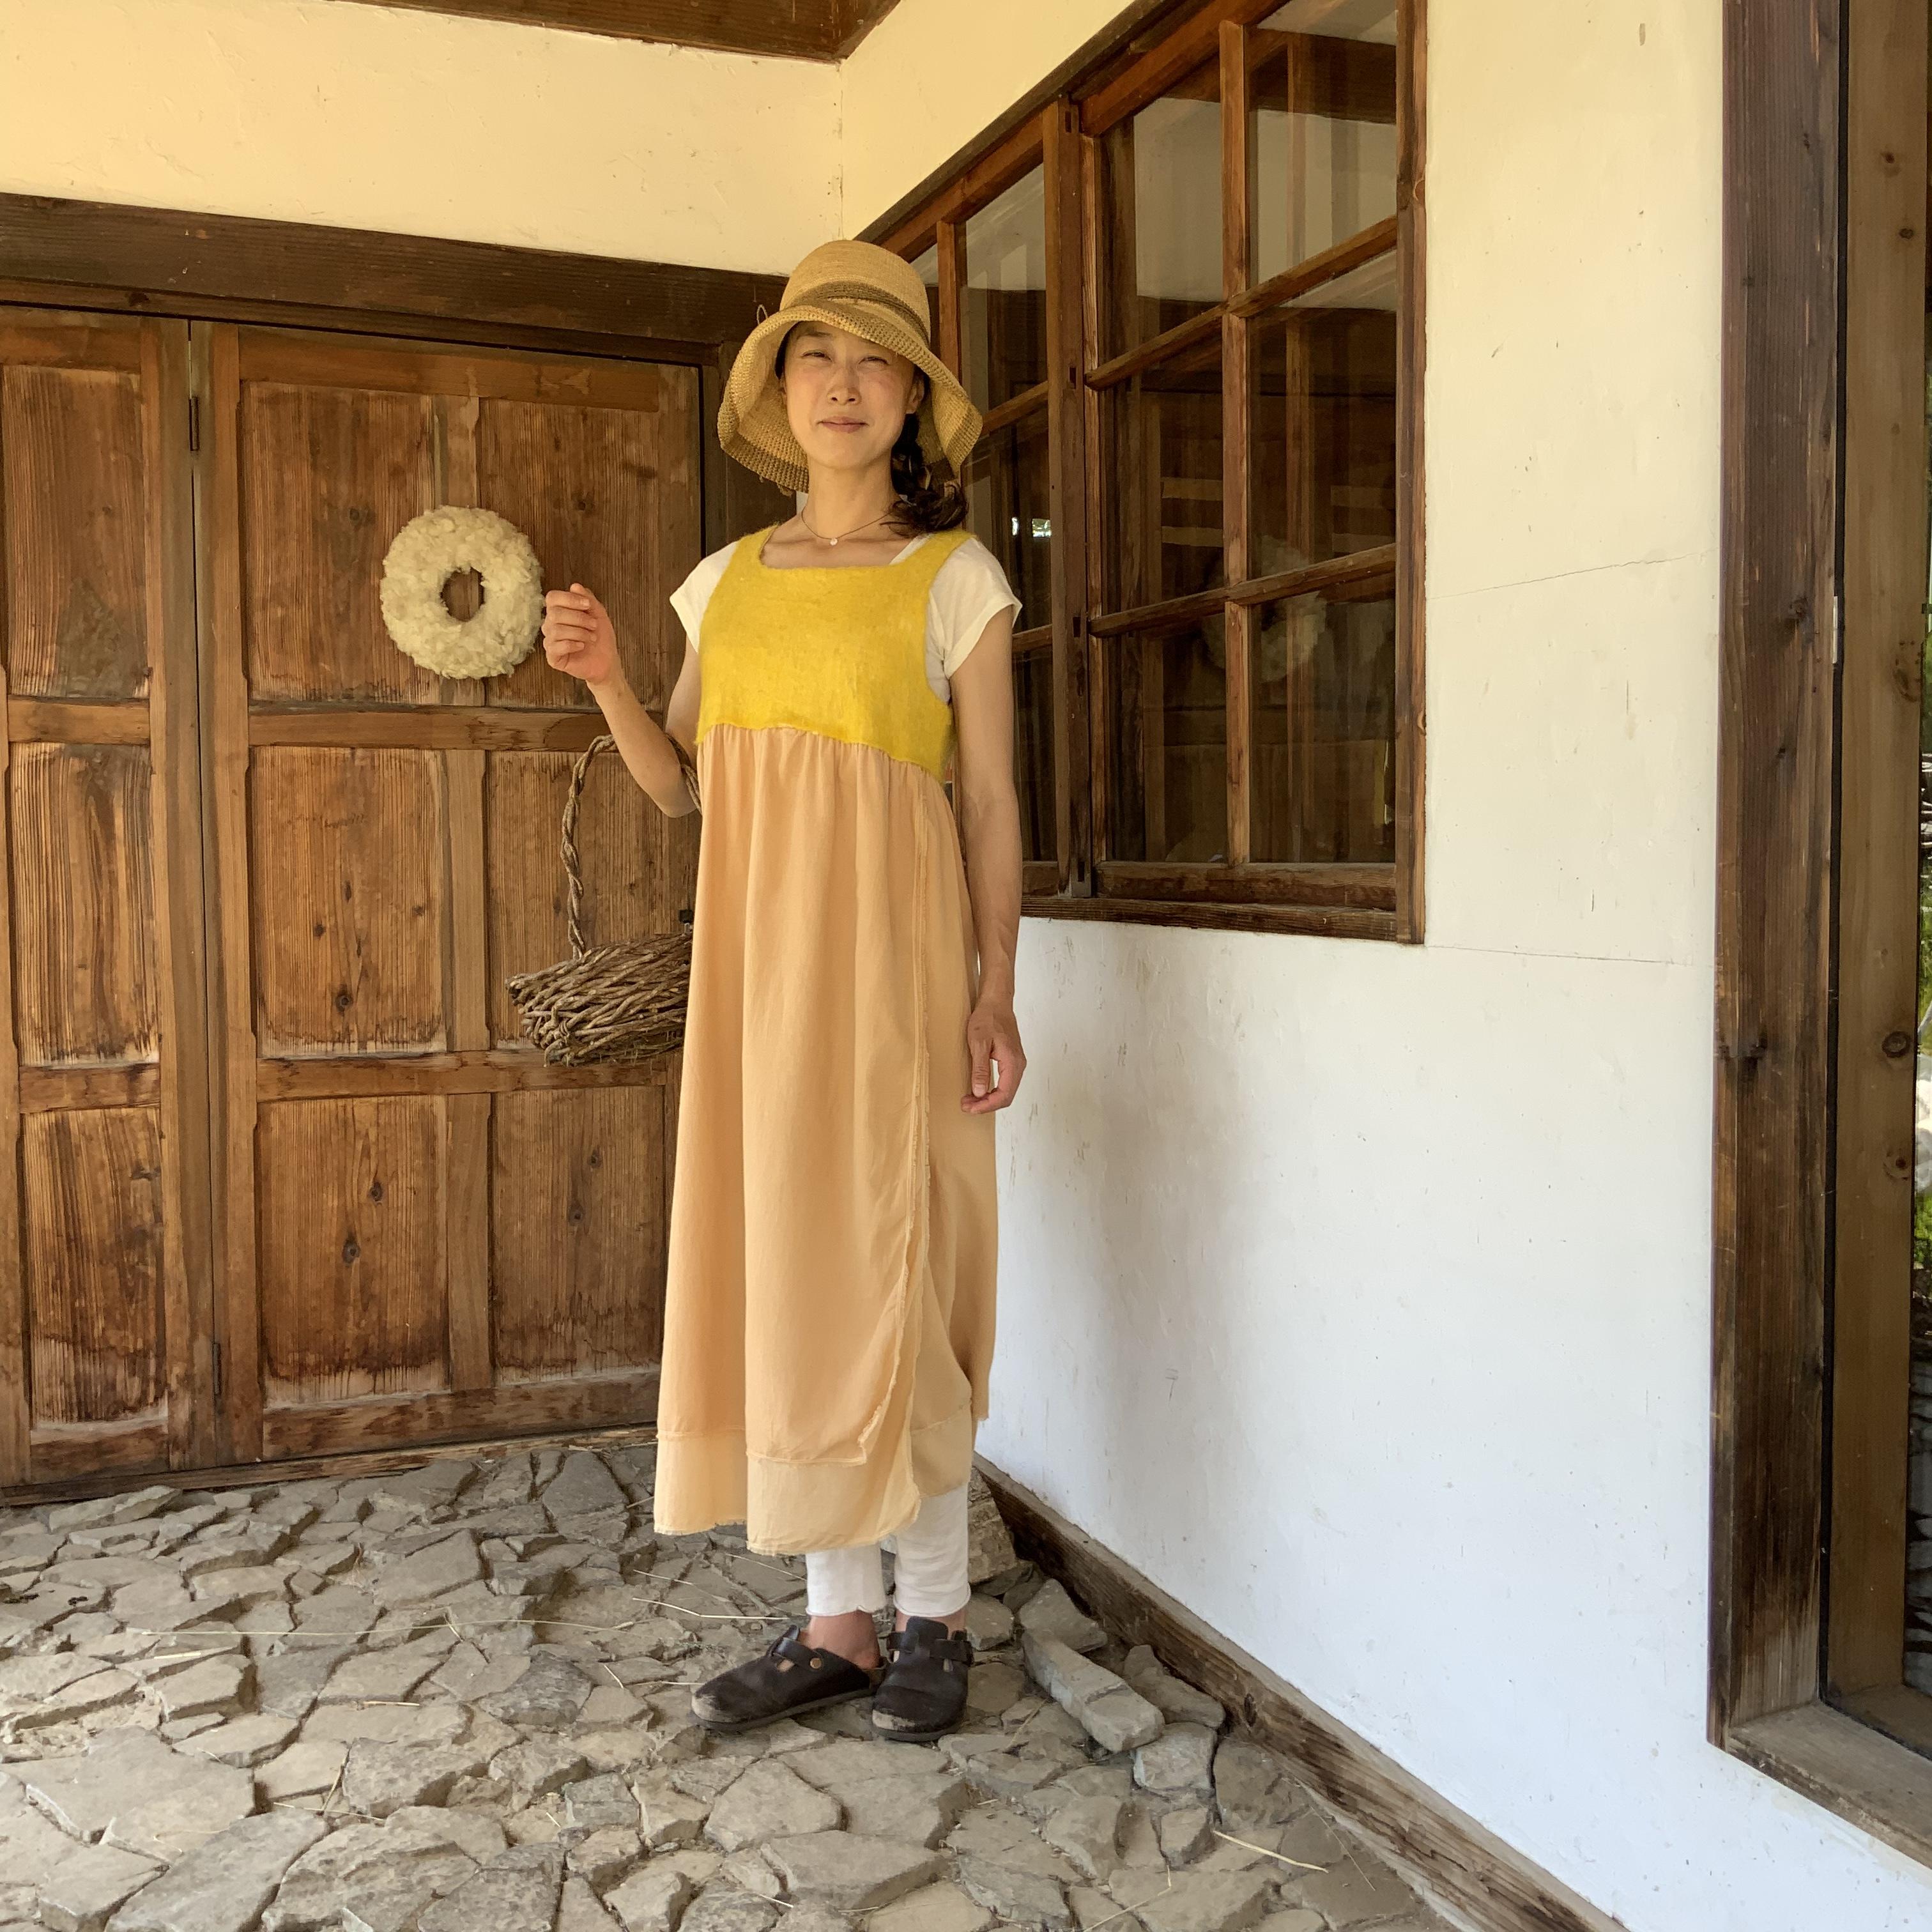 OPCL2-21005 ワンピースコリーヌ 黄色